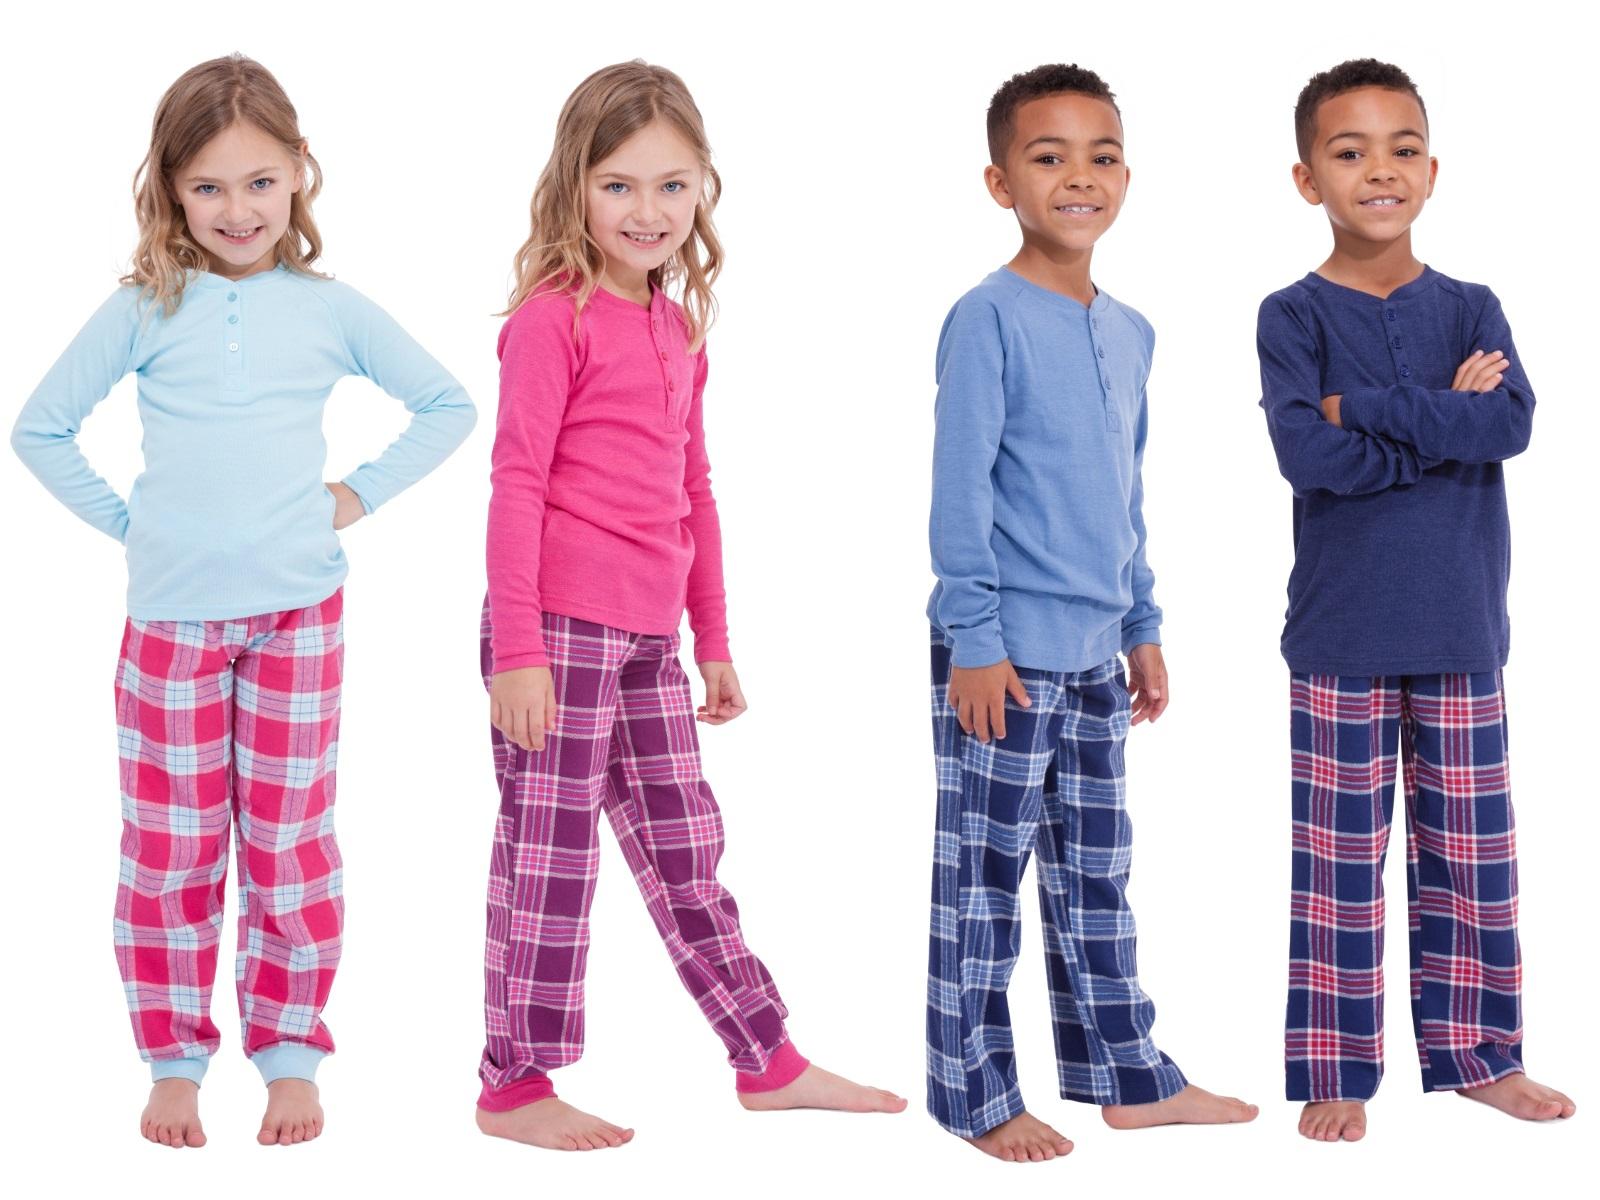 Childrens Christmas Sleepwear